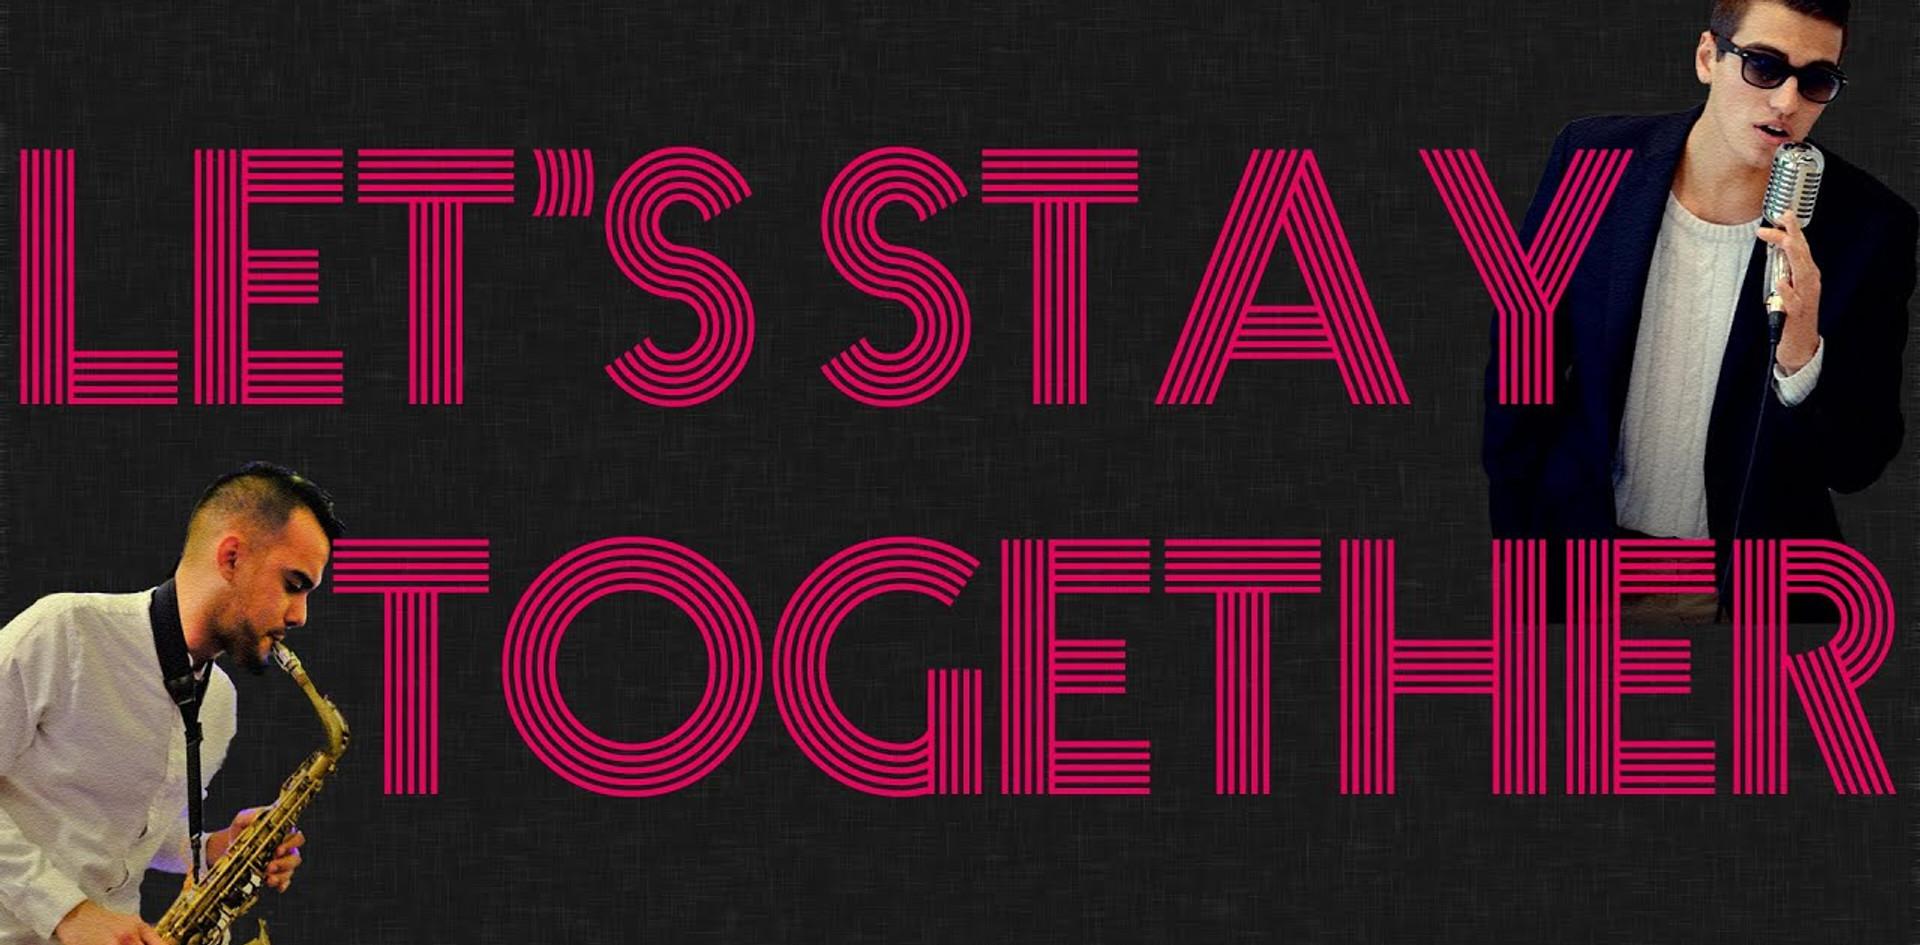 THOMAS ALLAIN & CARLOS VIZOSO — Let's Stay Together (Al Green)